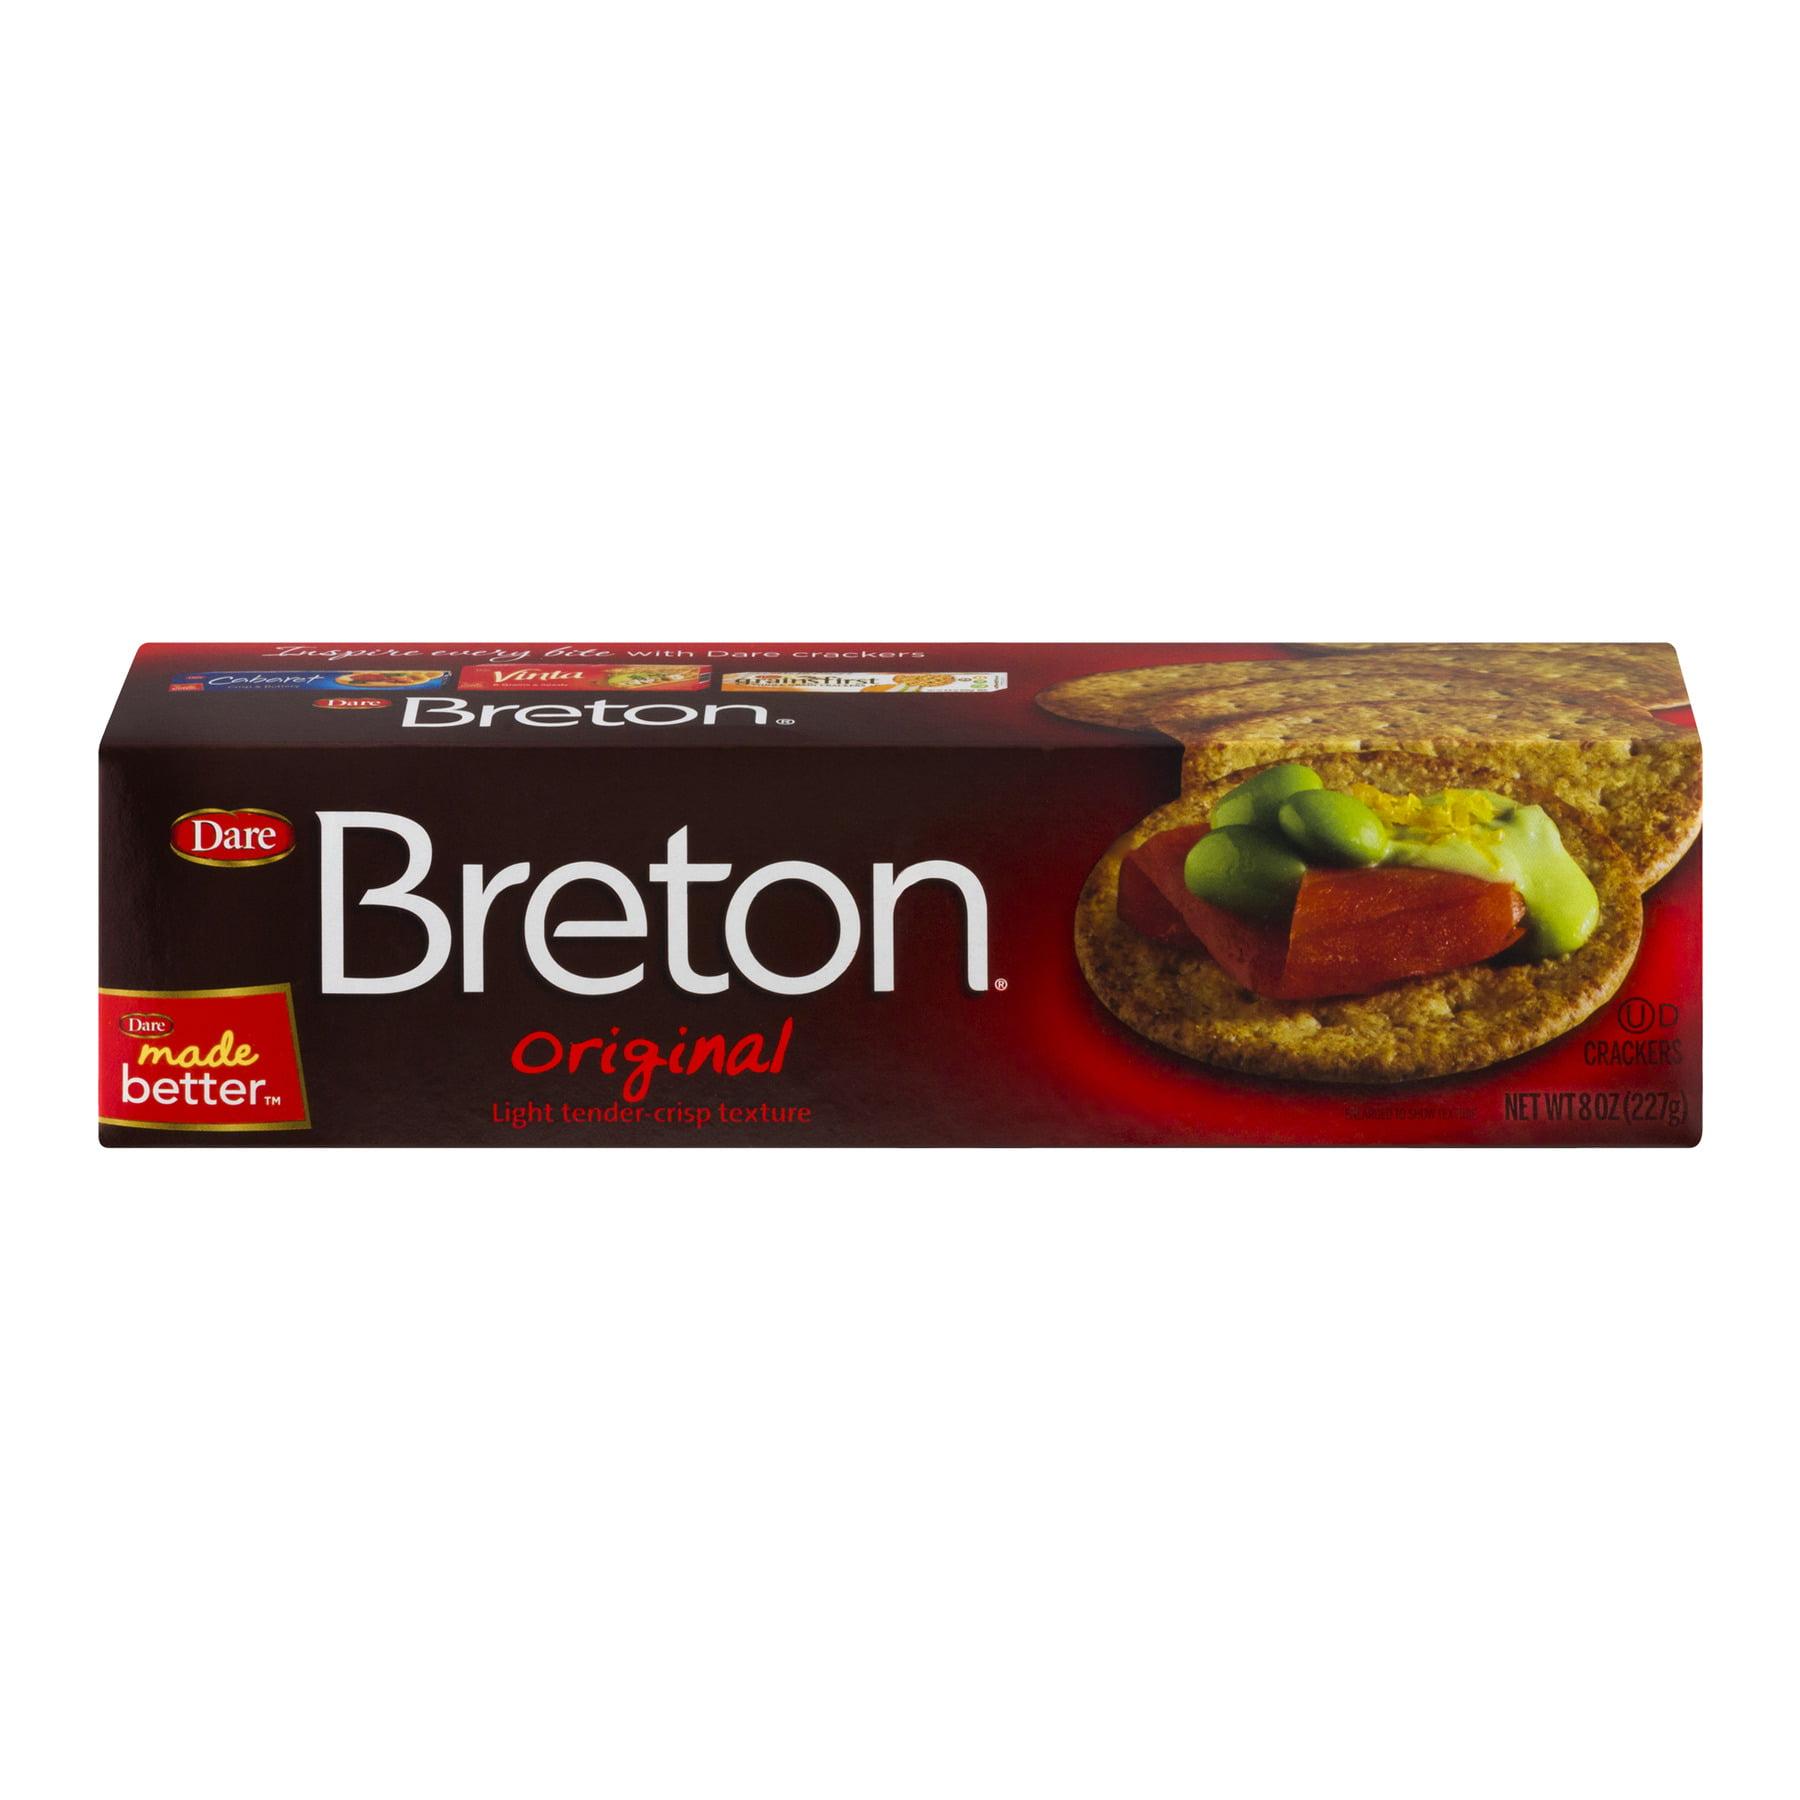 Breton Original Crackers, 8 oz